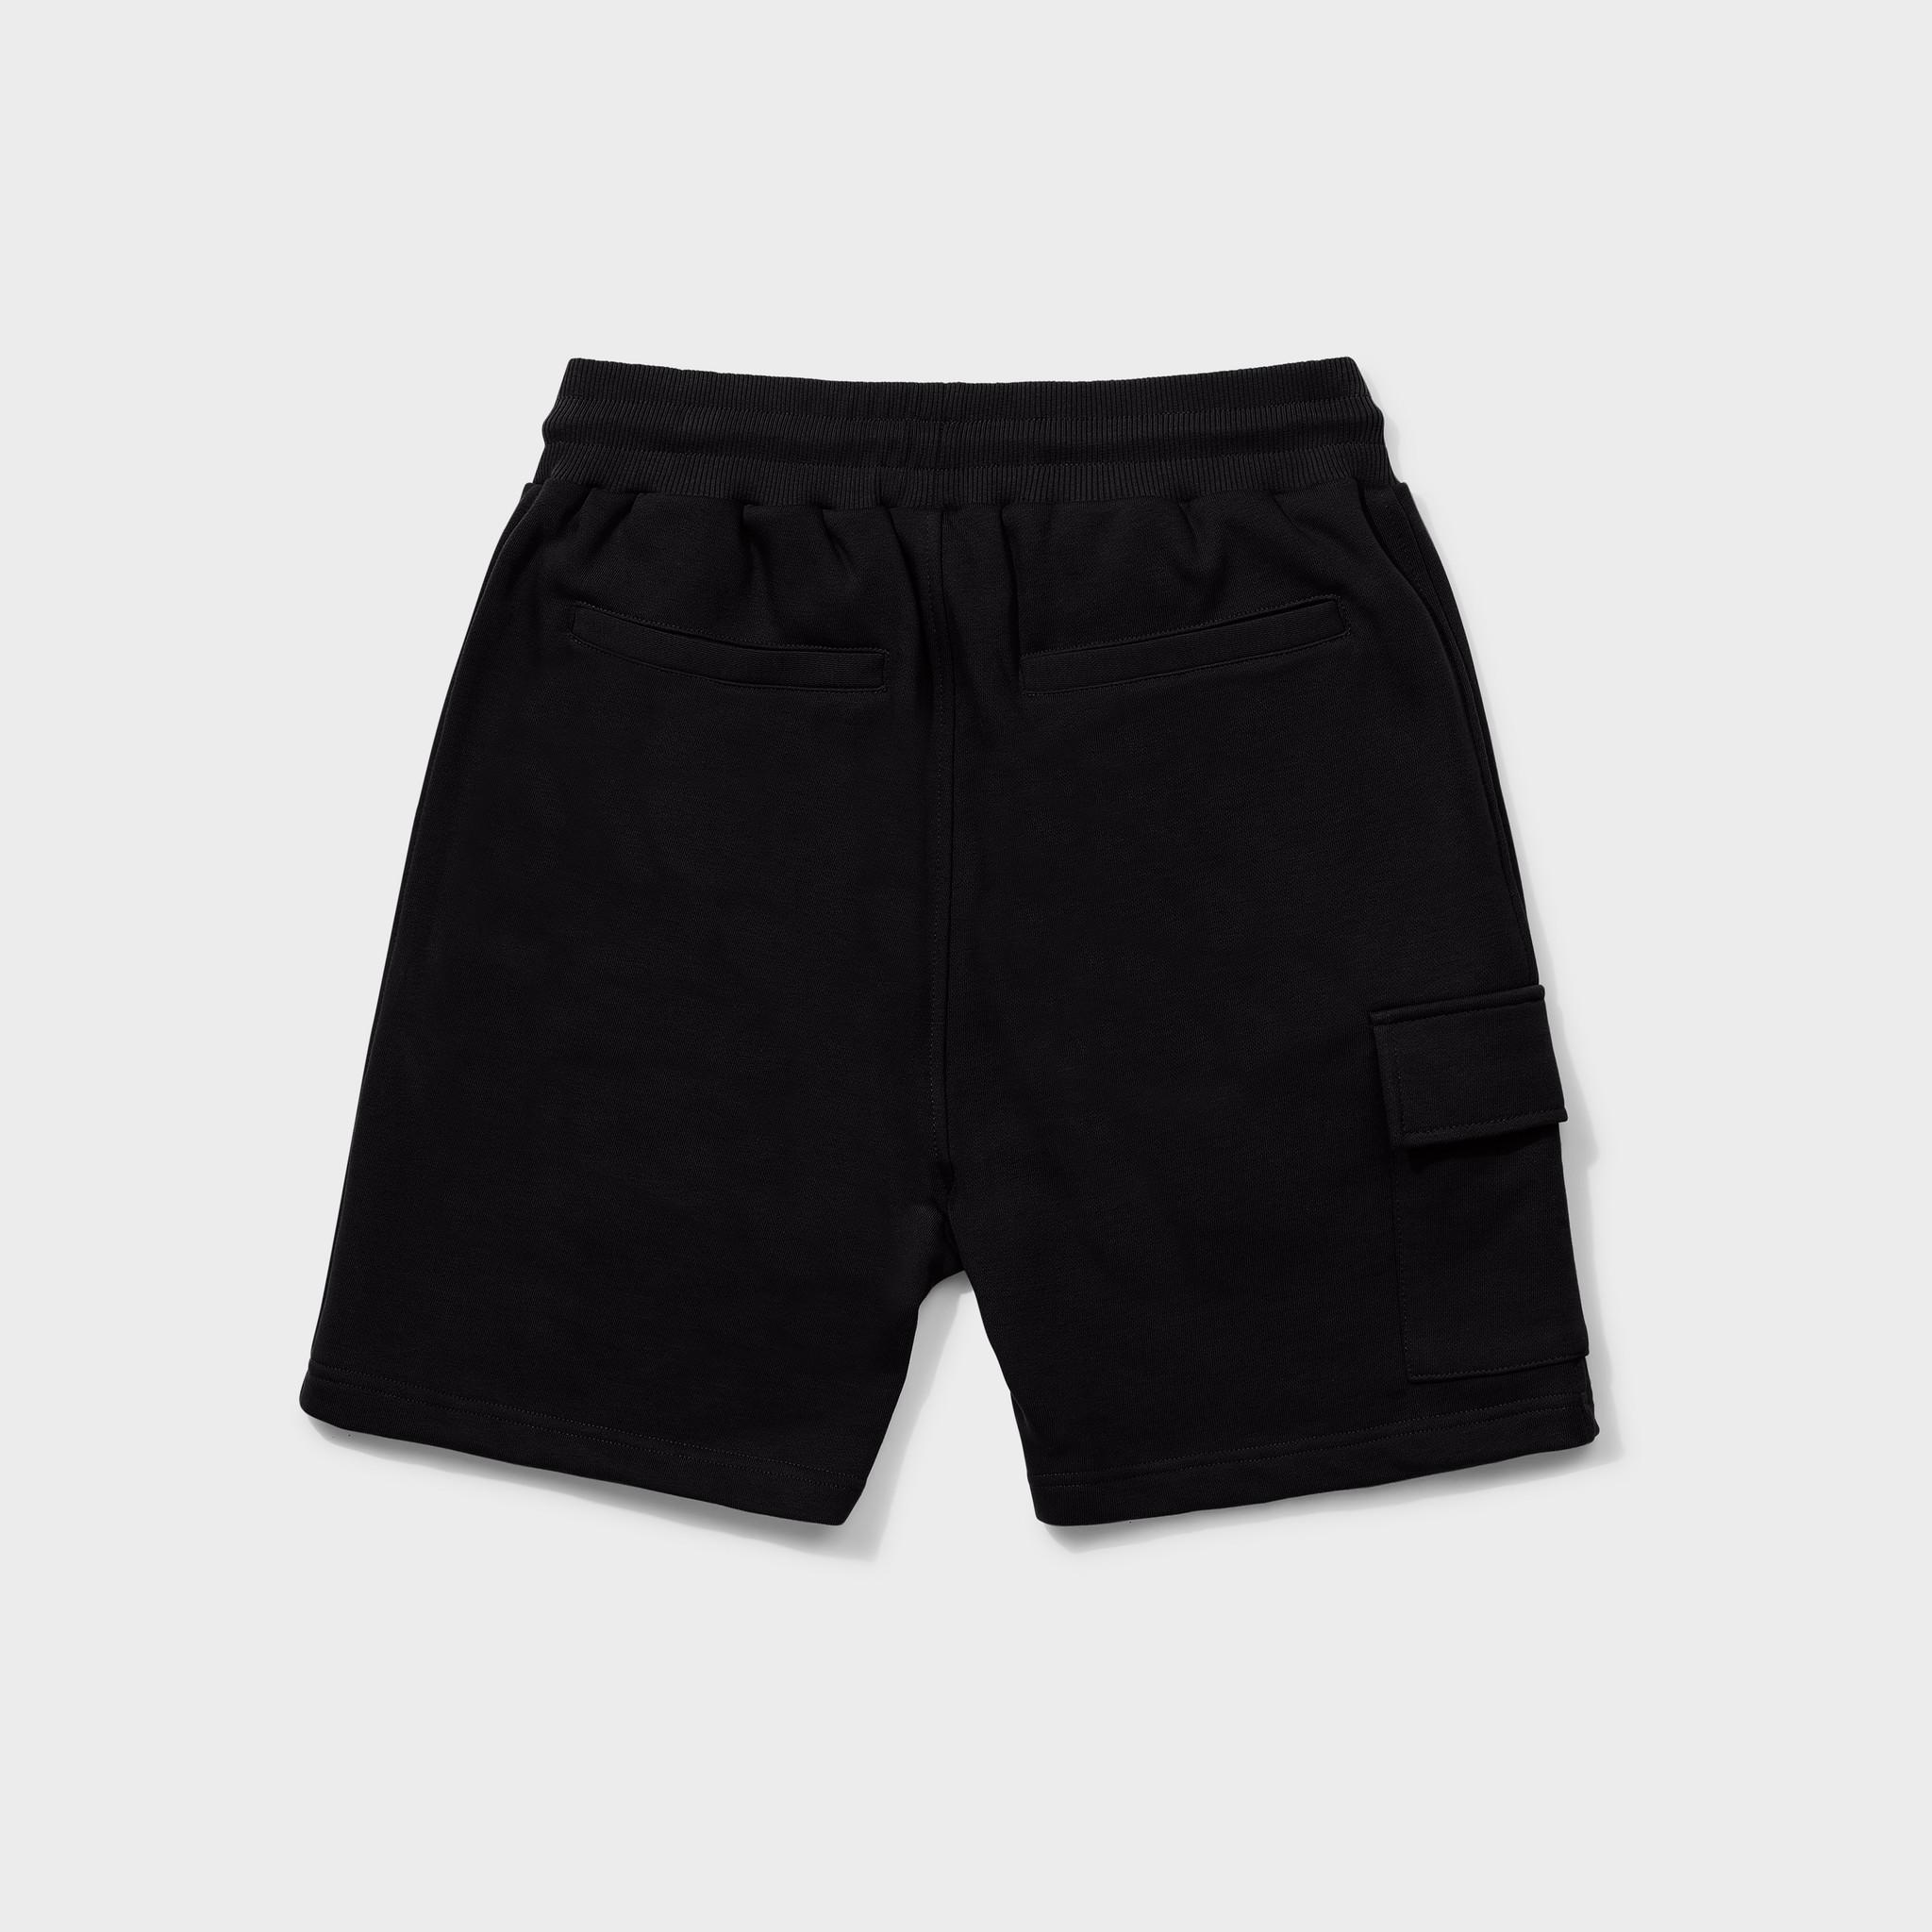 Travis shorts black-2